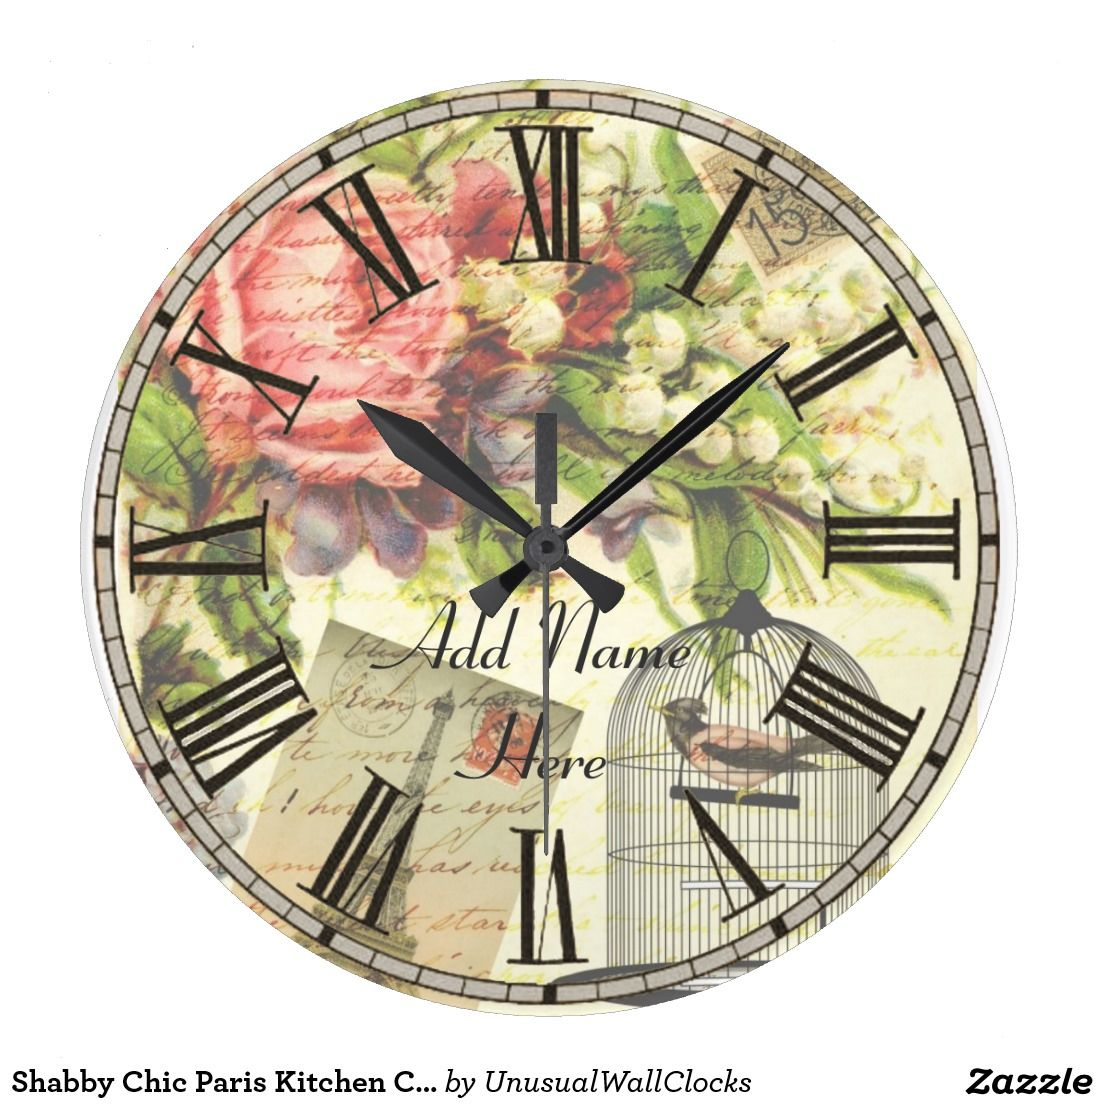 Shabby Chic Paris Kitchen Clock add name customize design by Unusual Wall Clocks - customizable